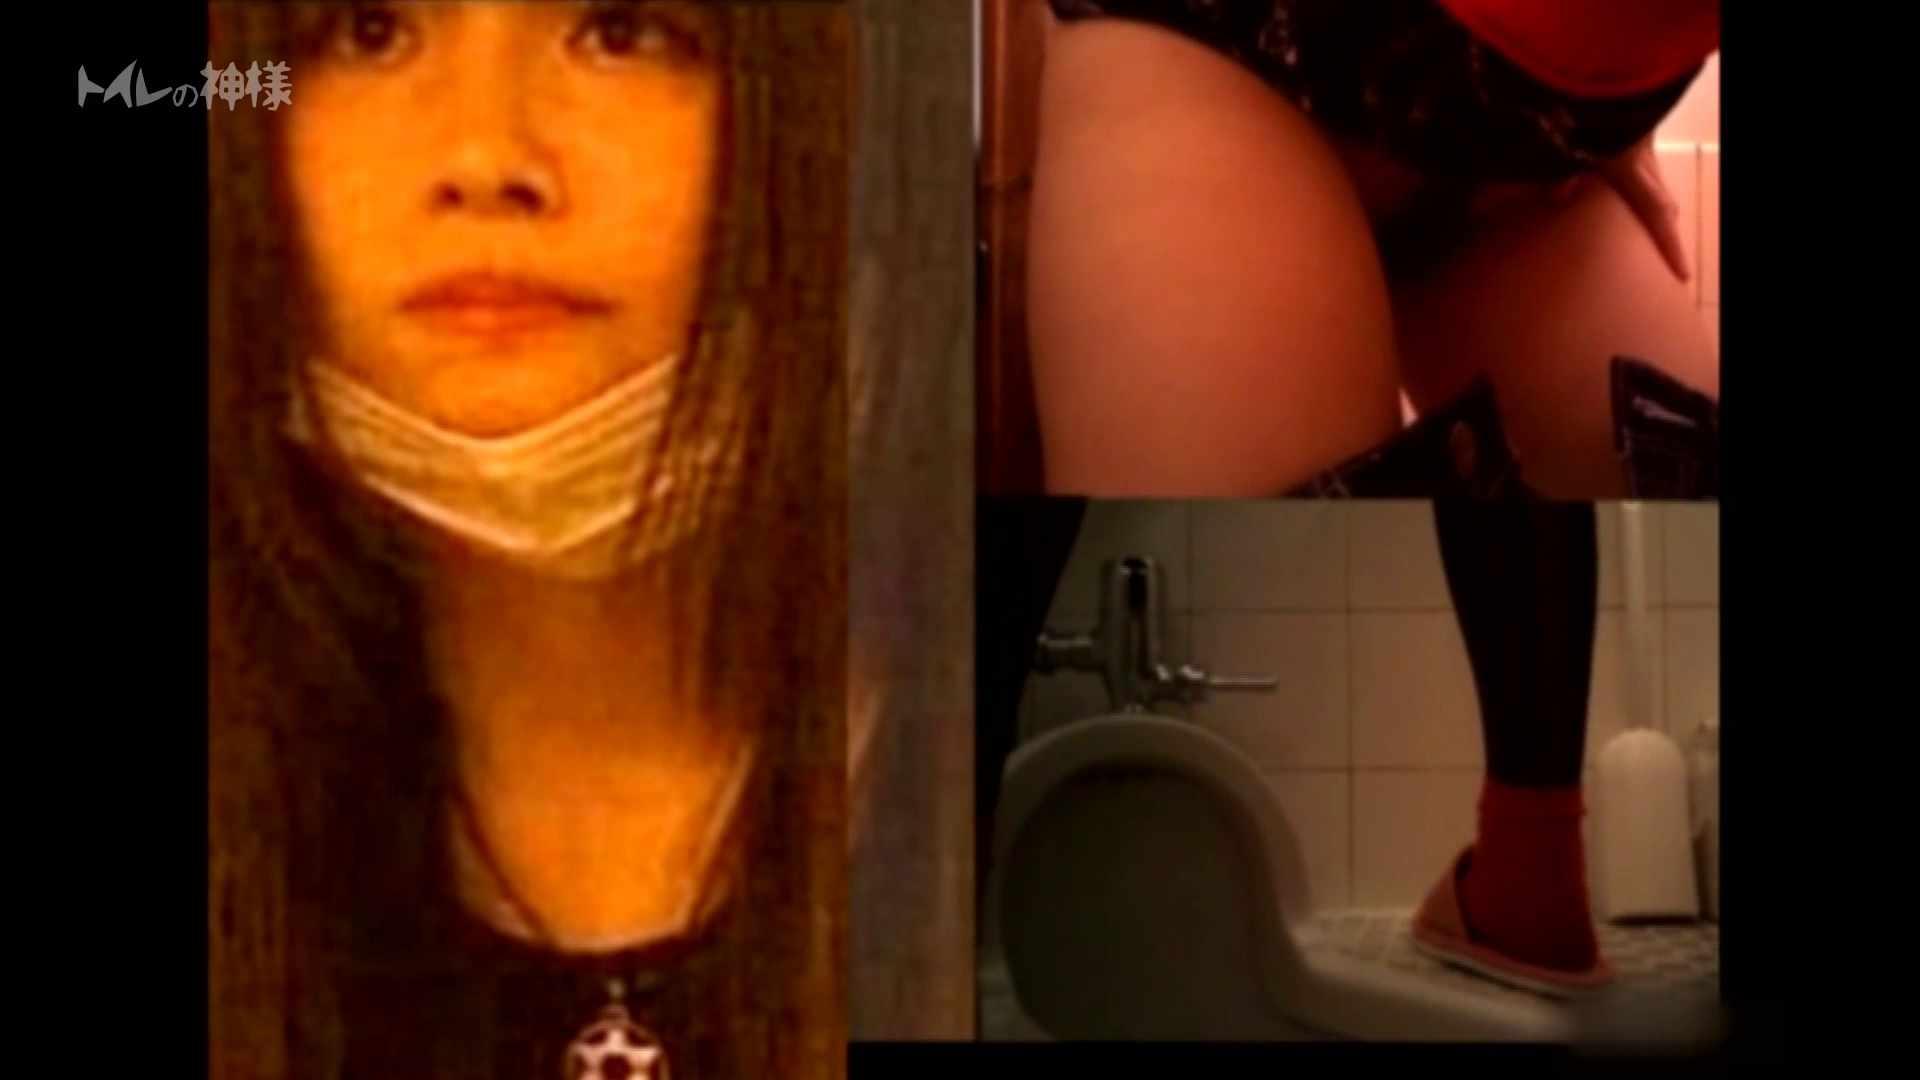 Vol.02 花の女子大生うんこ盗撮2 トイレの実態 盗撮動画紹介 108PIX 68